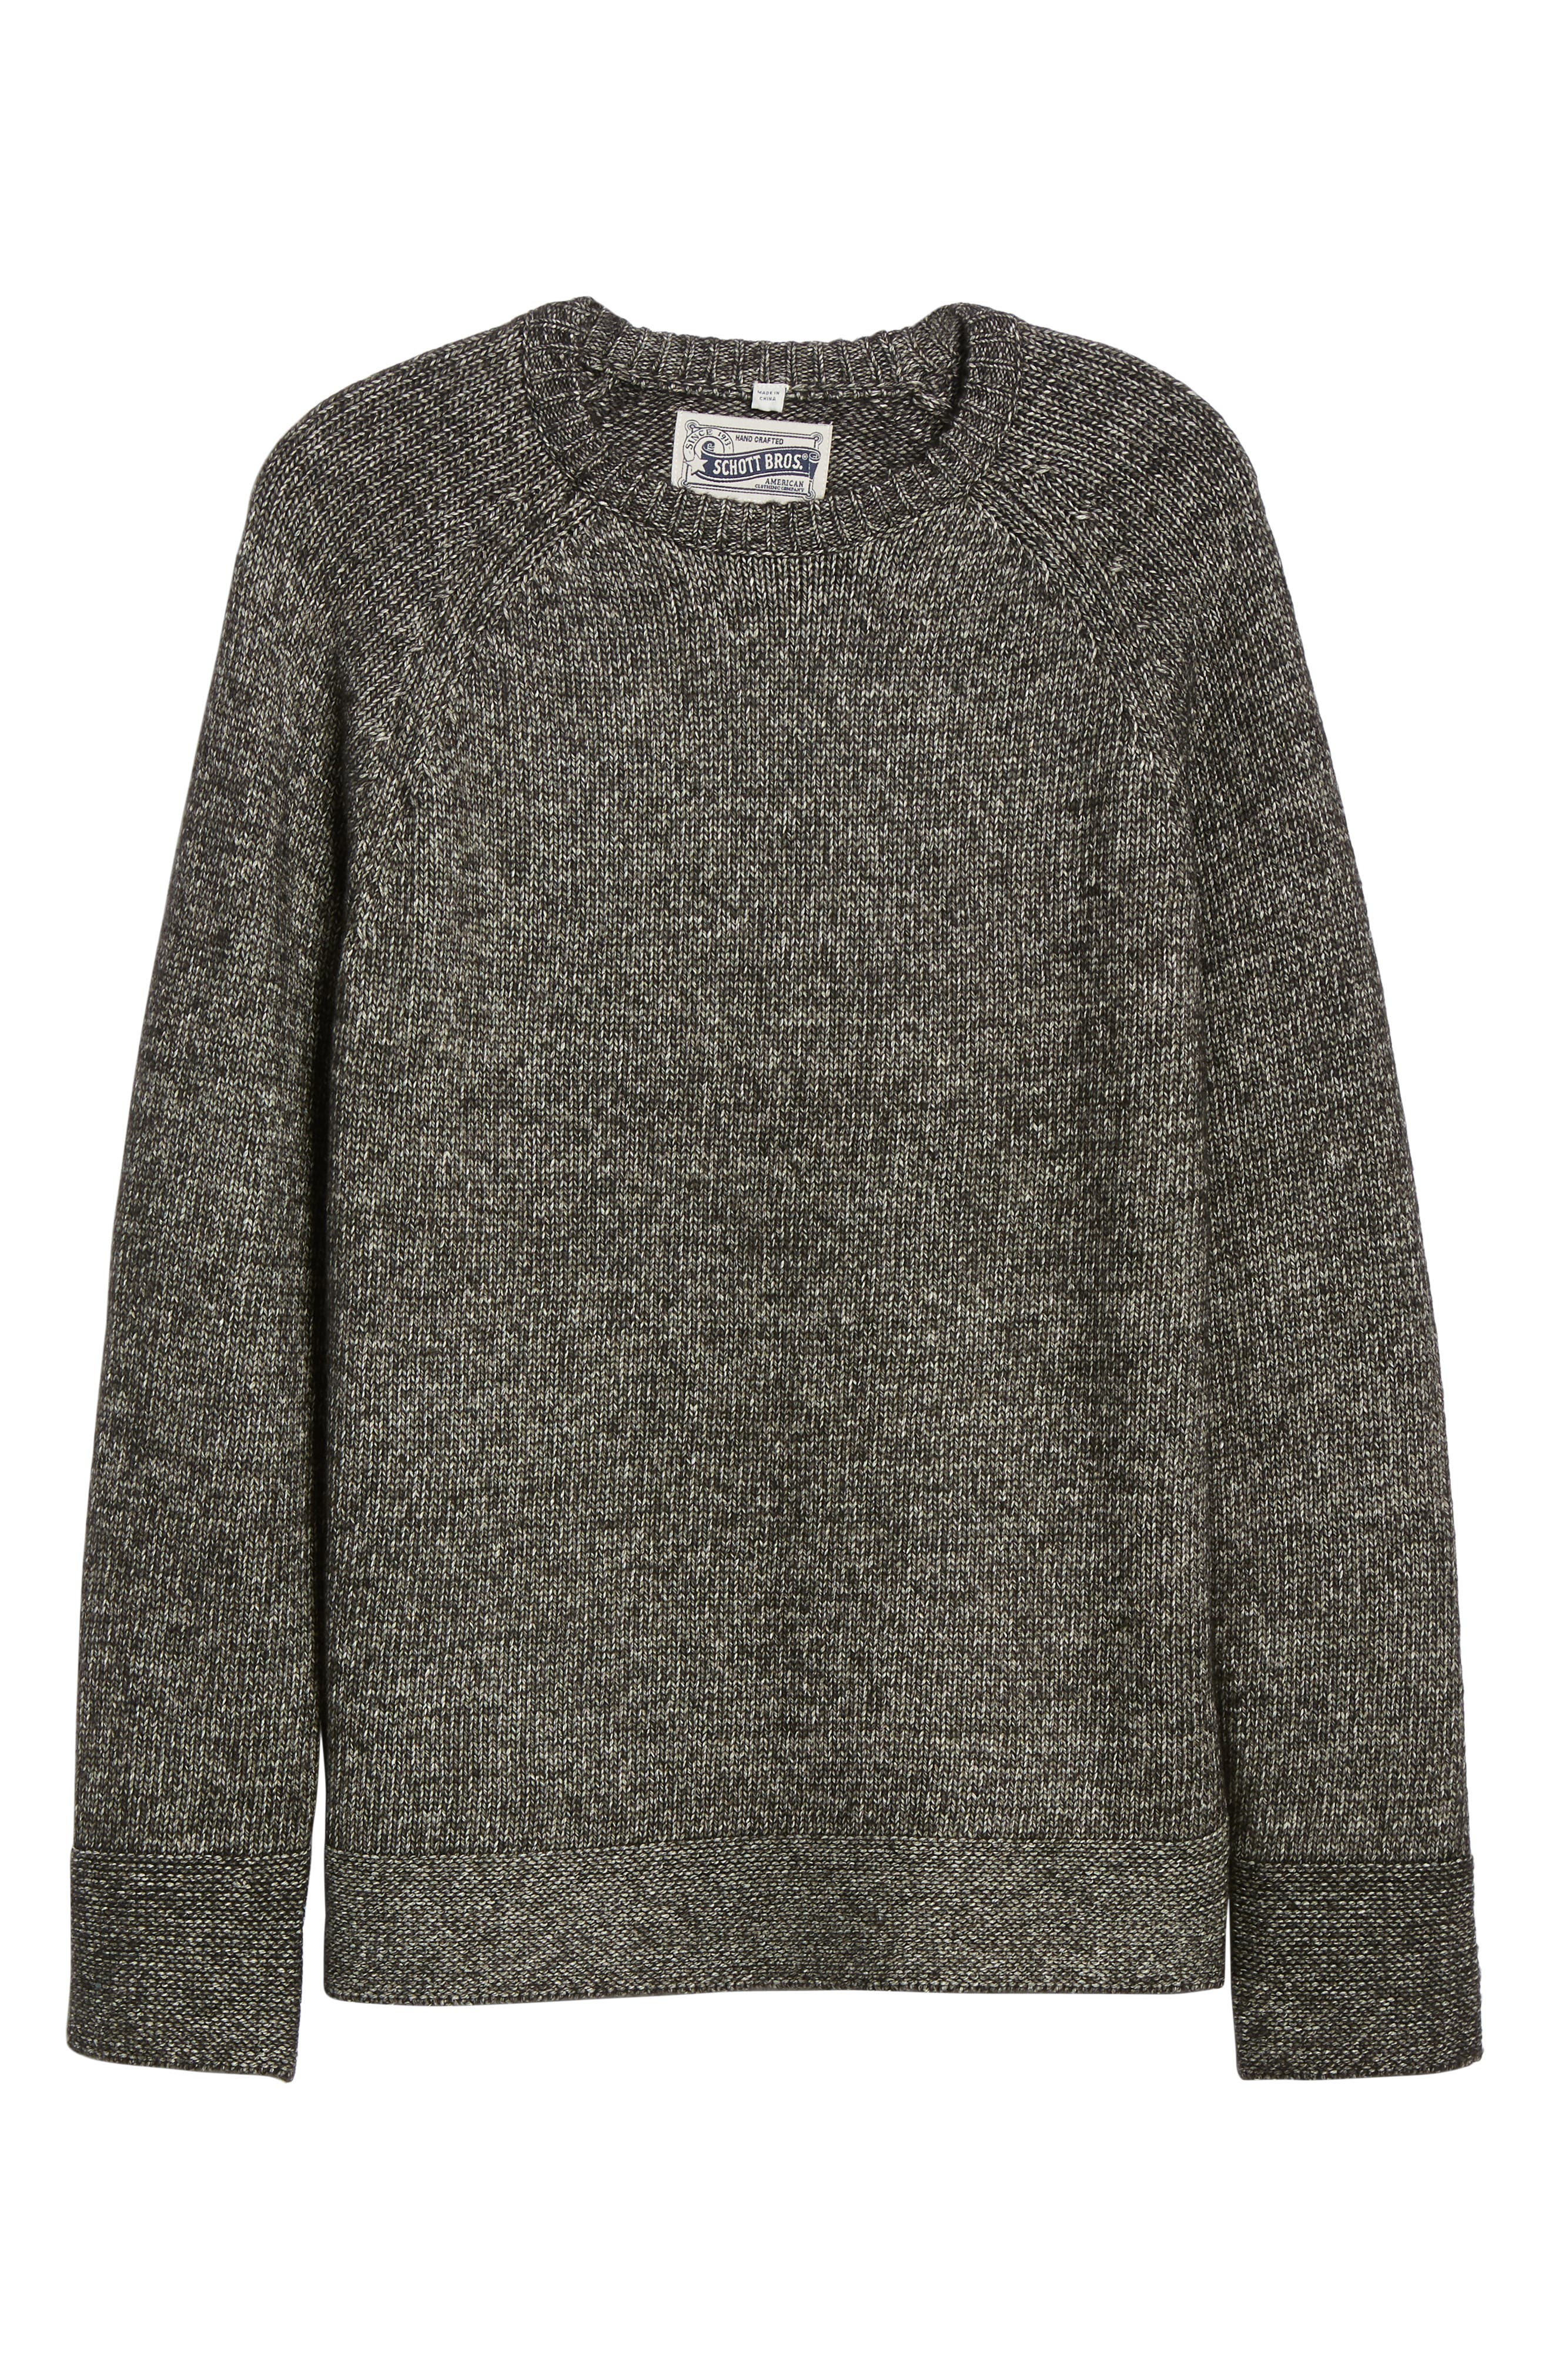 Multi Yarn Crewneck Raglan Sweater,                             Alternate thumbnail 6, color,                             BLACK